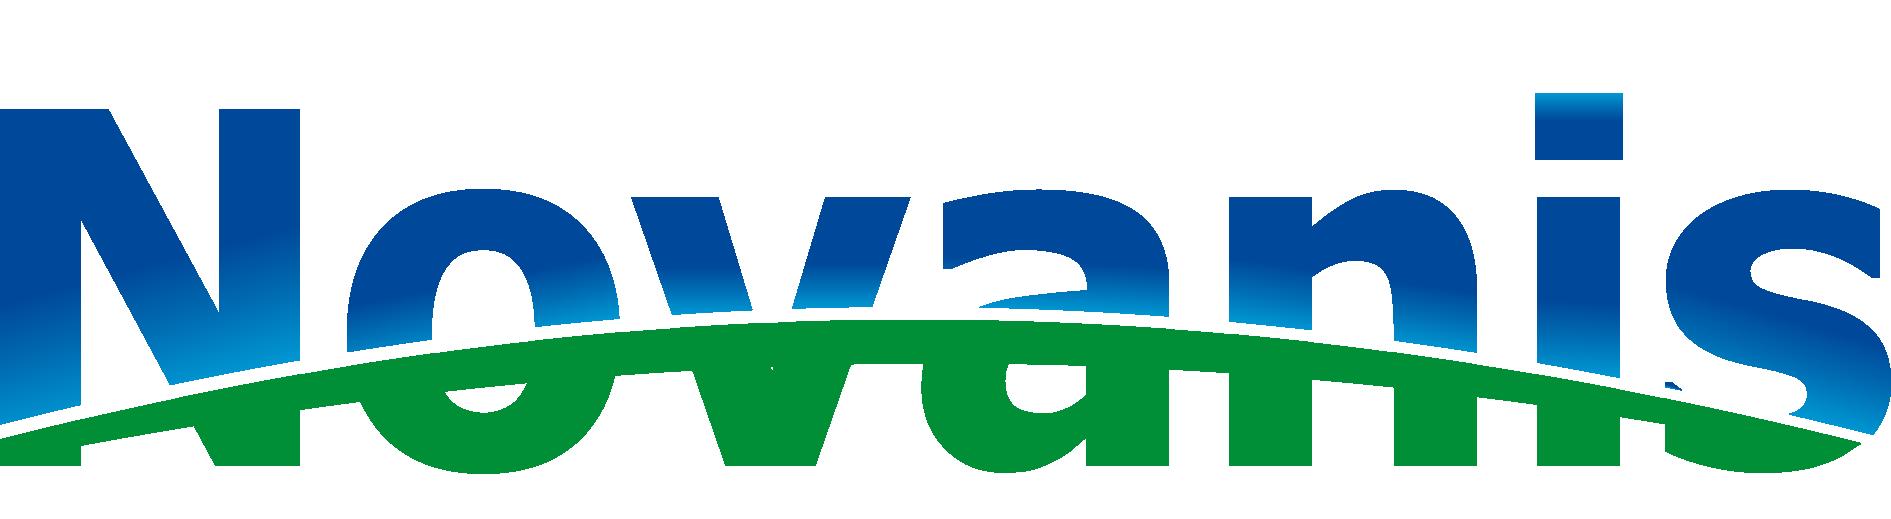 Novanis